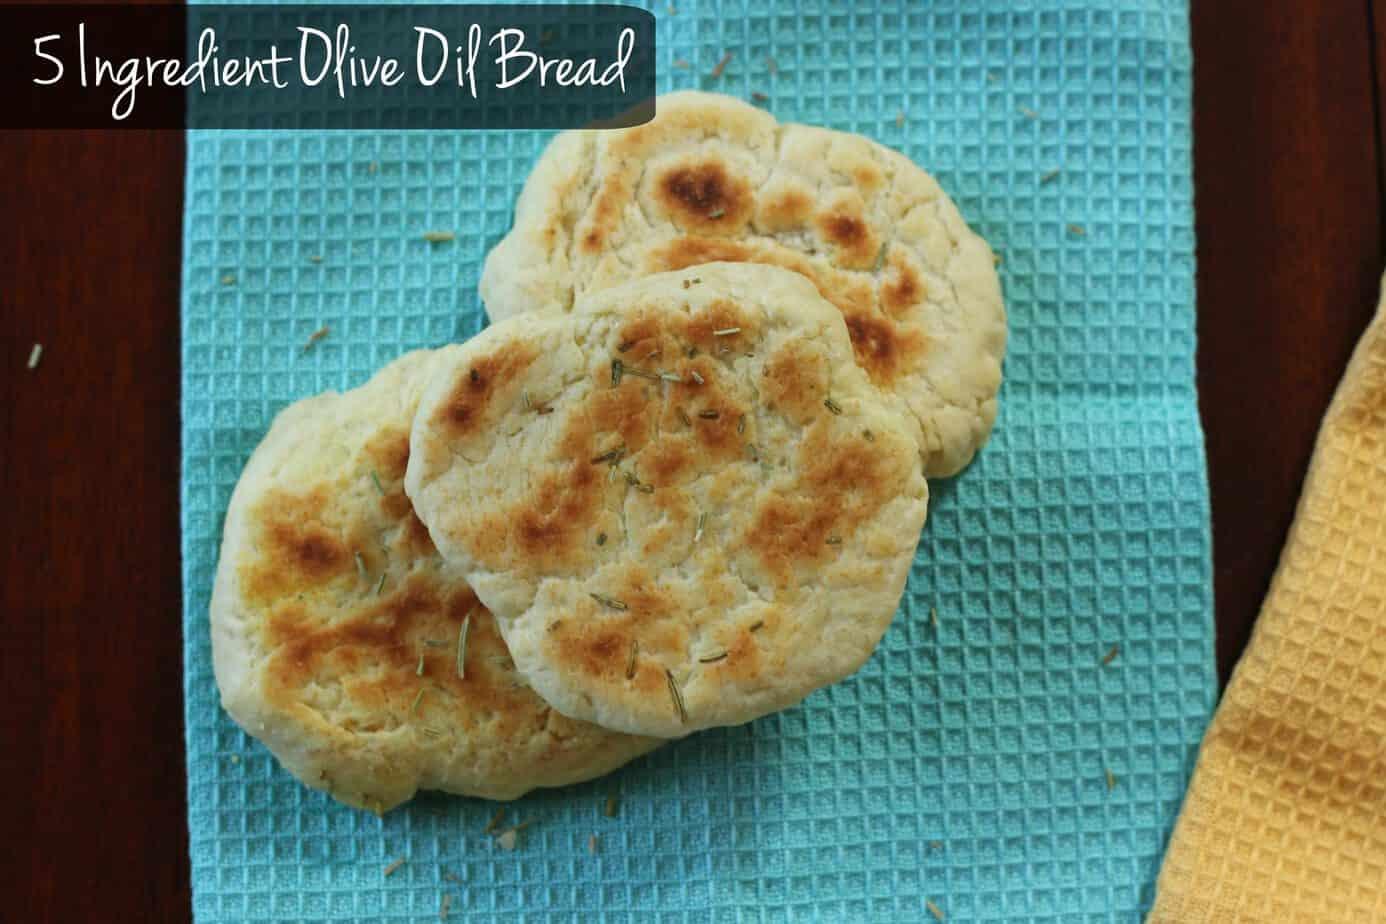 5 ingredient olive oil bread